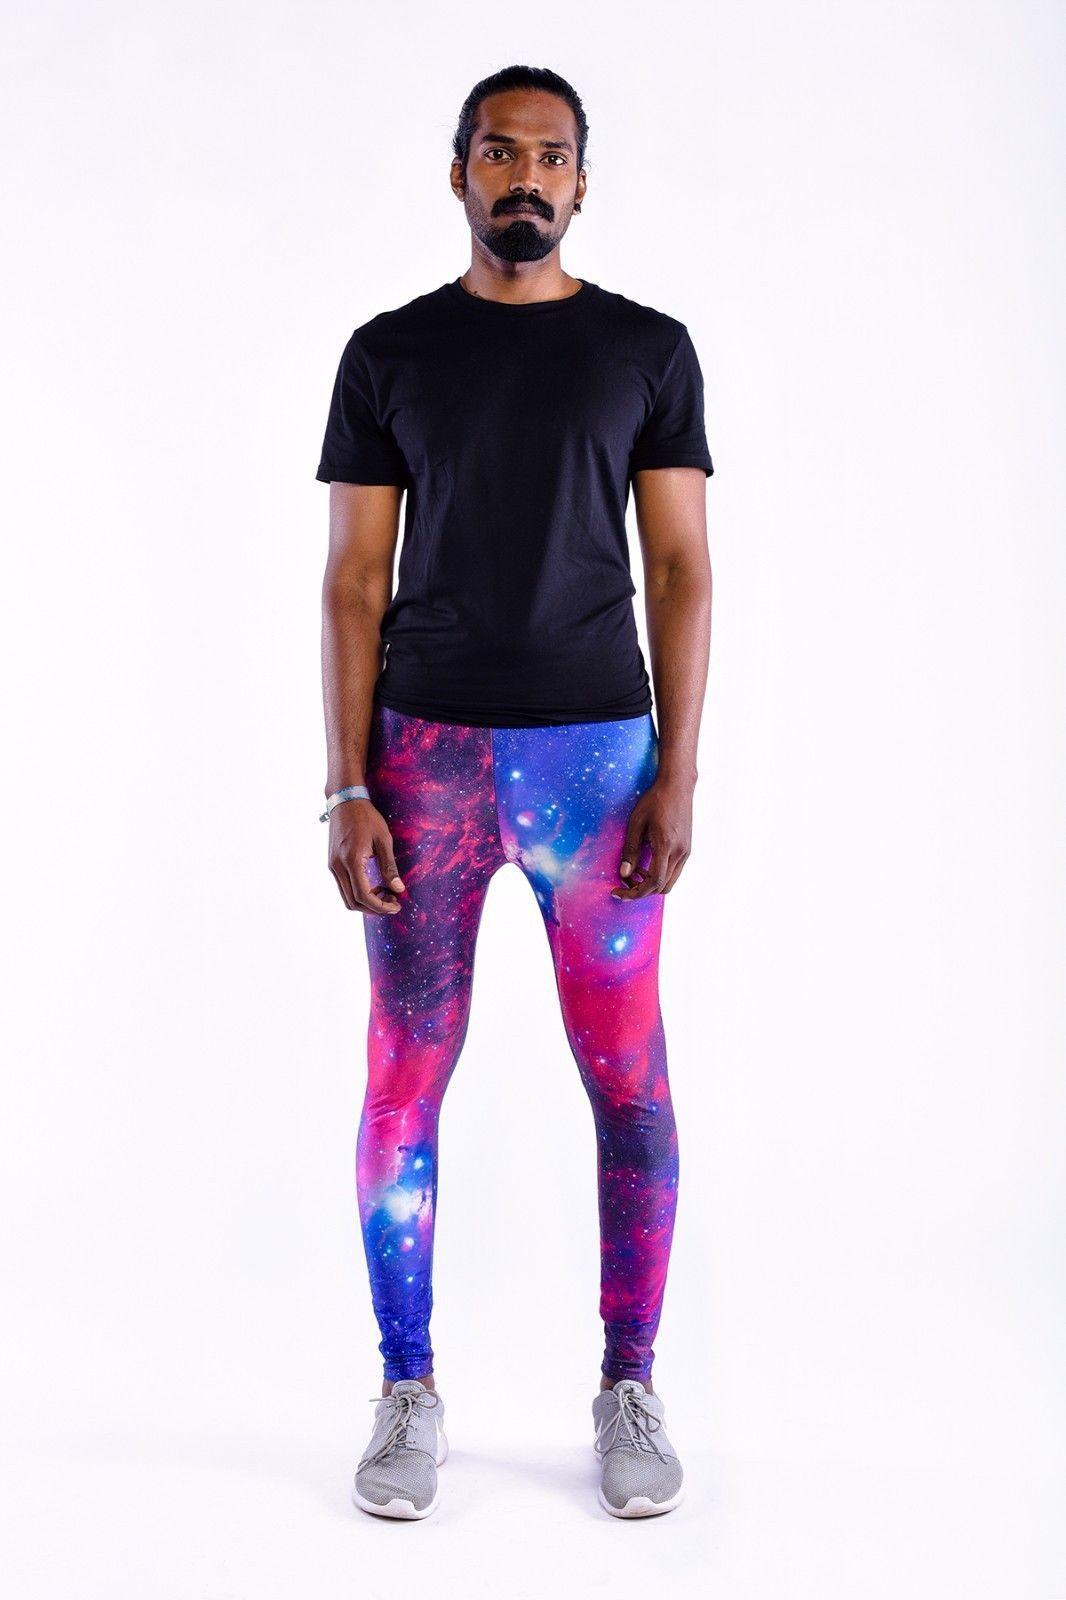 KAPOW Interstellar Meggings // Men's Festival Leggings in Blue Galaxy Print